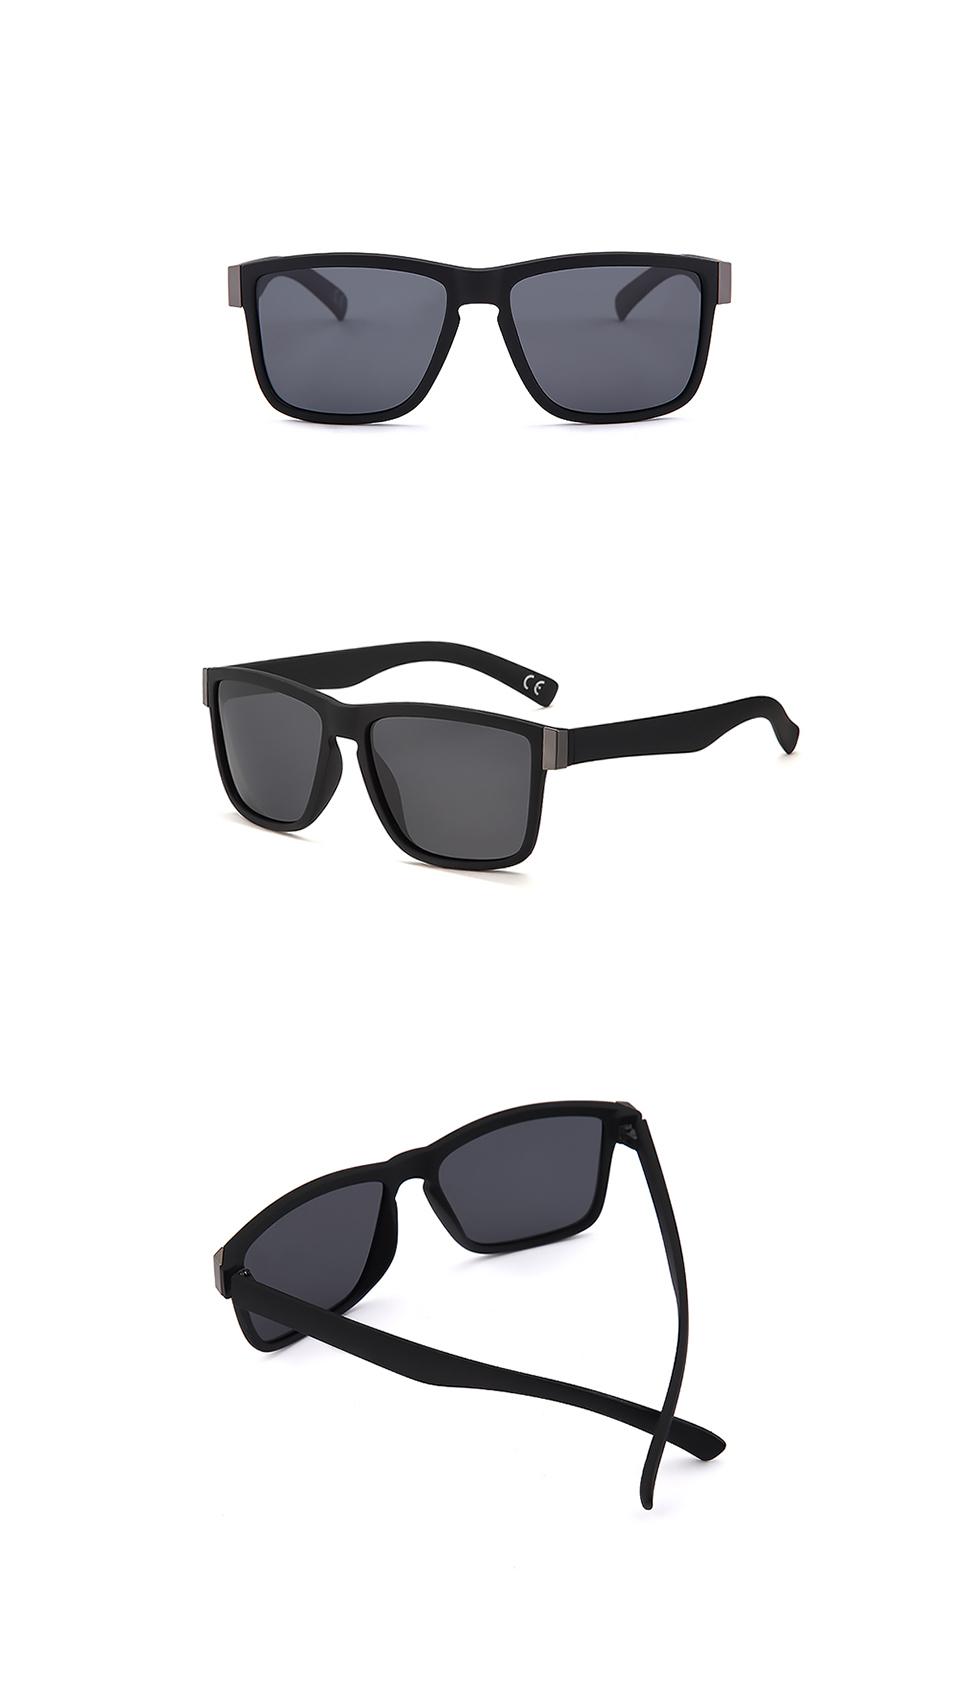 4562 34830c - Okulary Męskie VENTI Elegance Polaryzacja UV400